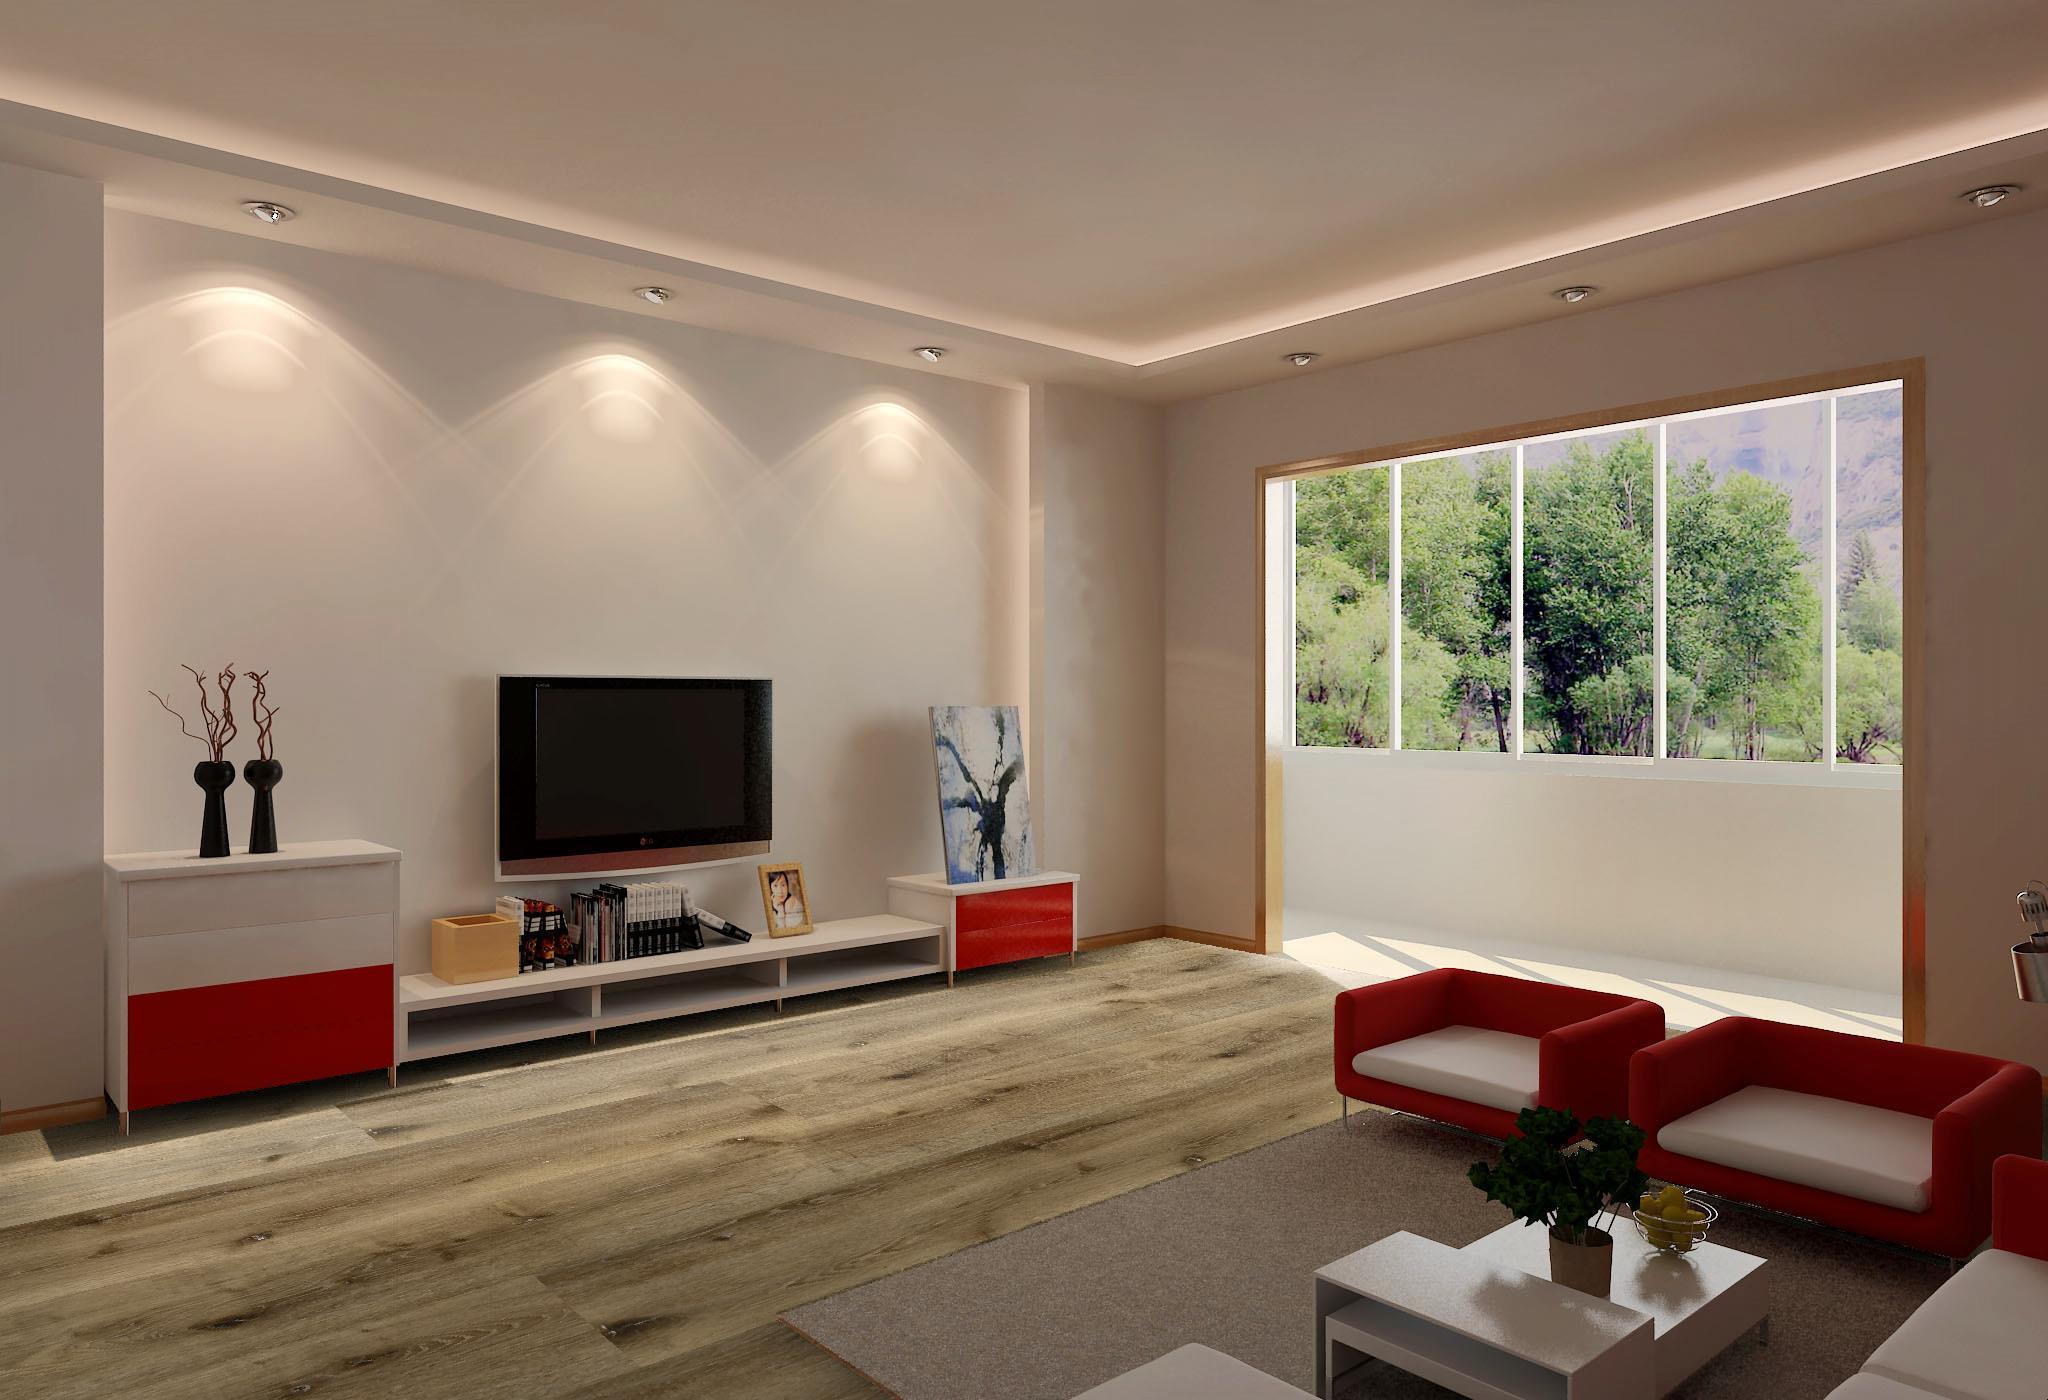 spc flooring manufacturer